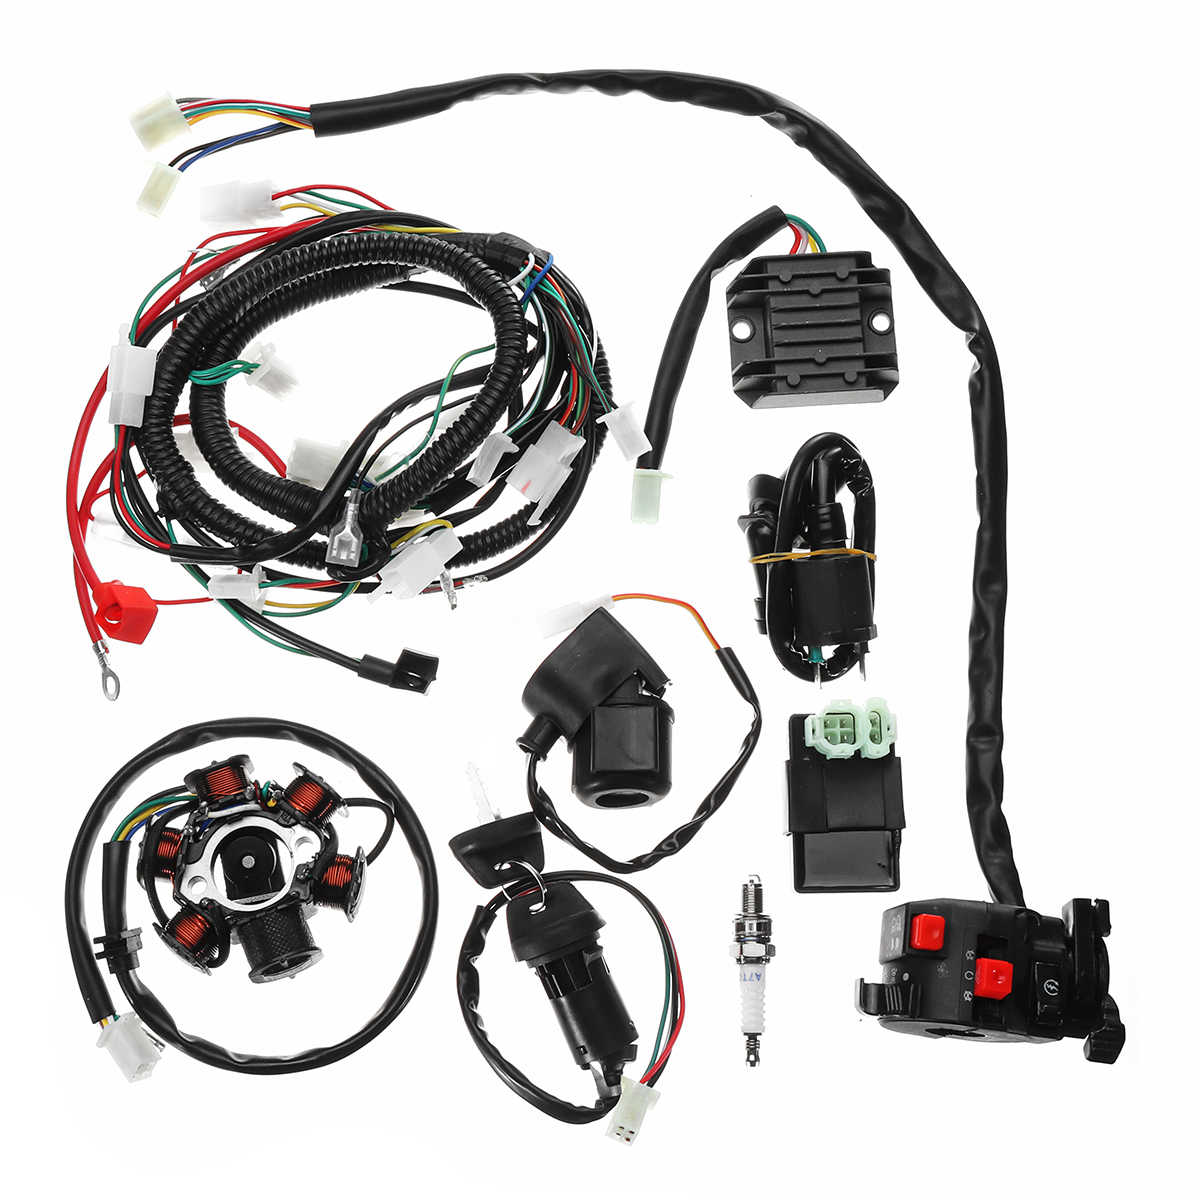 Cableado eléctrico completo arnés Loom CDI bobina para GY6 150CC ATV Quad Buggy Go Kart con rectificador + relé solenoide + interruptor de encendido